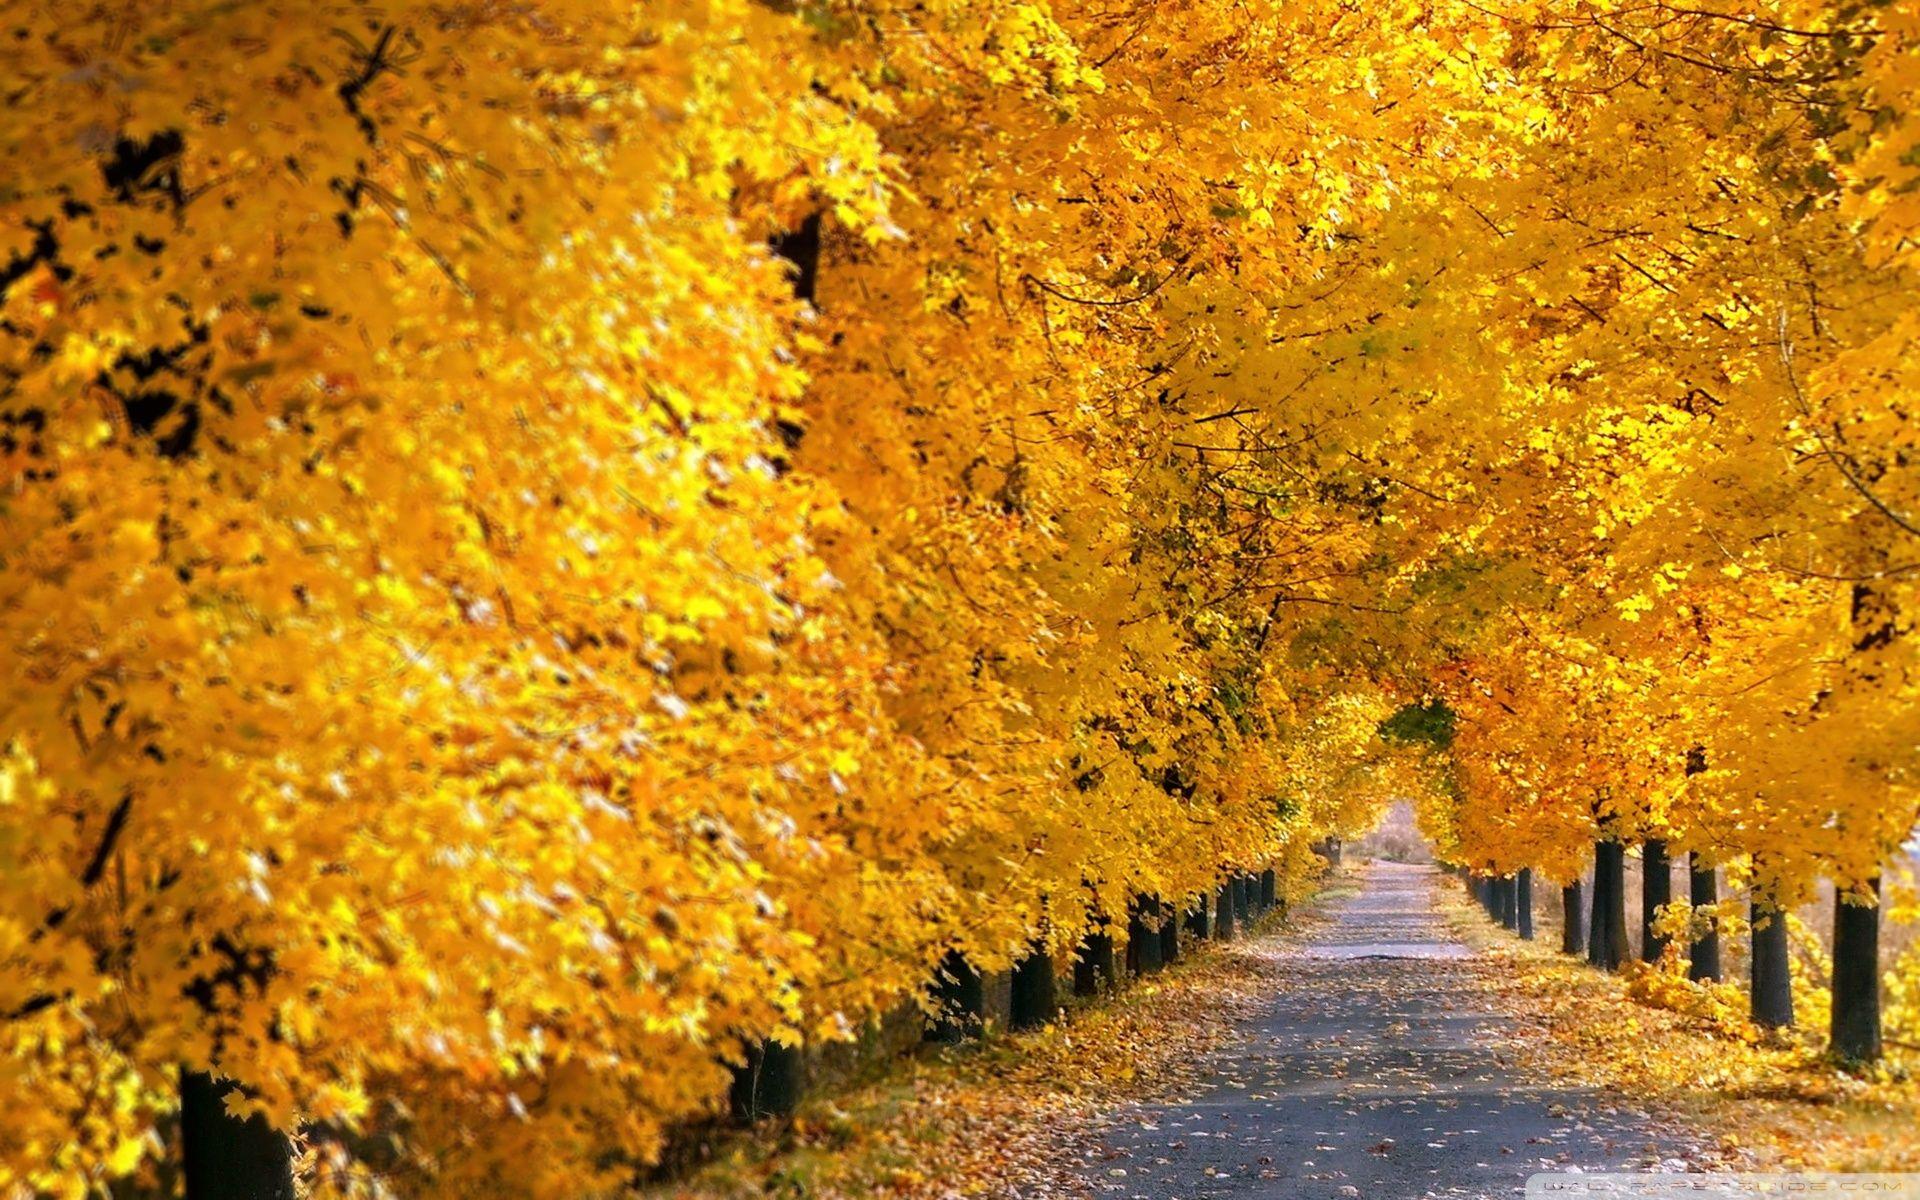 Fall Tree Pathway Hd Desktop Wallpaper High Definition Yellow Tree Autumn Scenery Autumn Trees